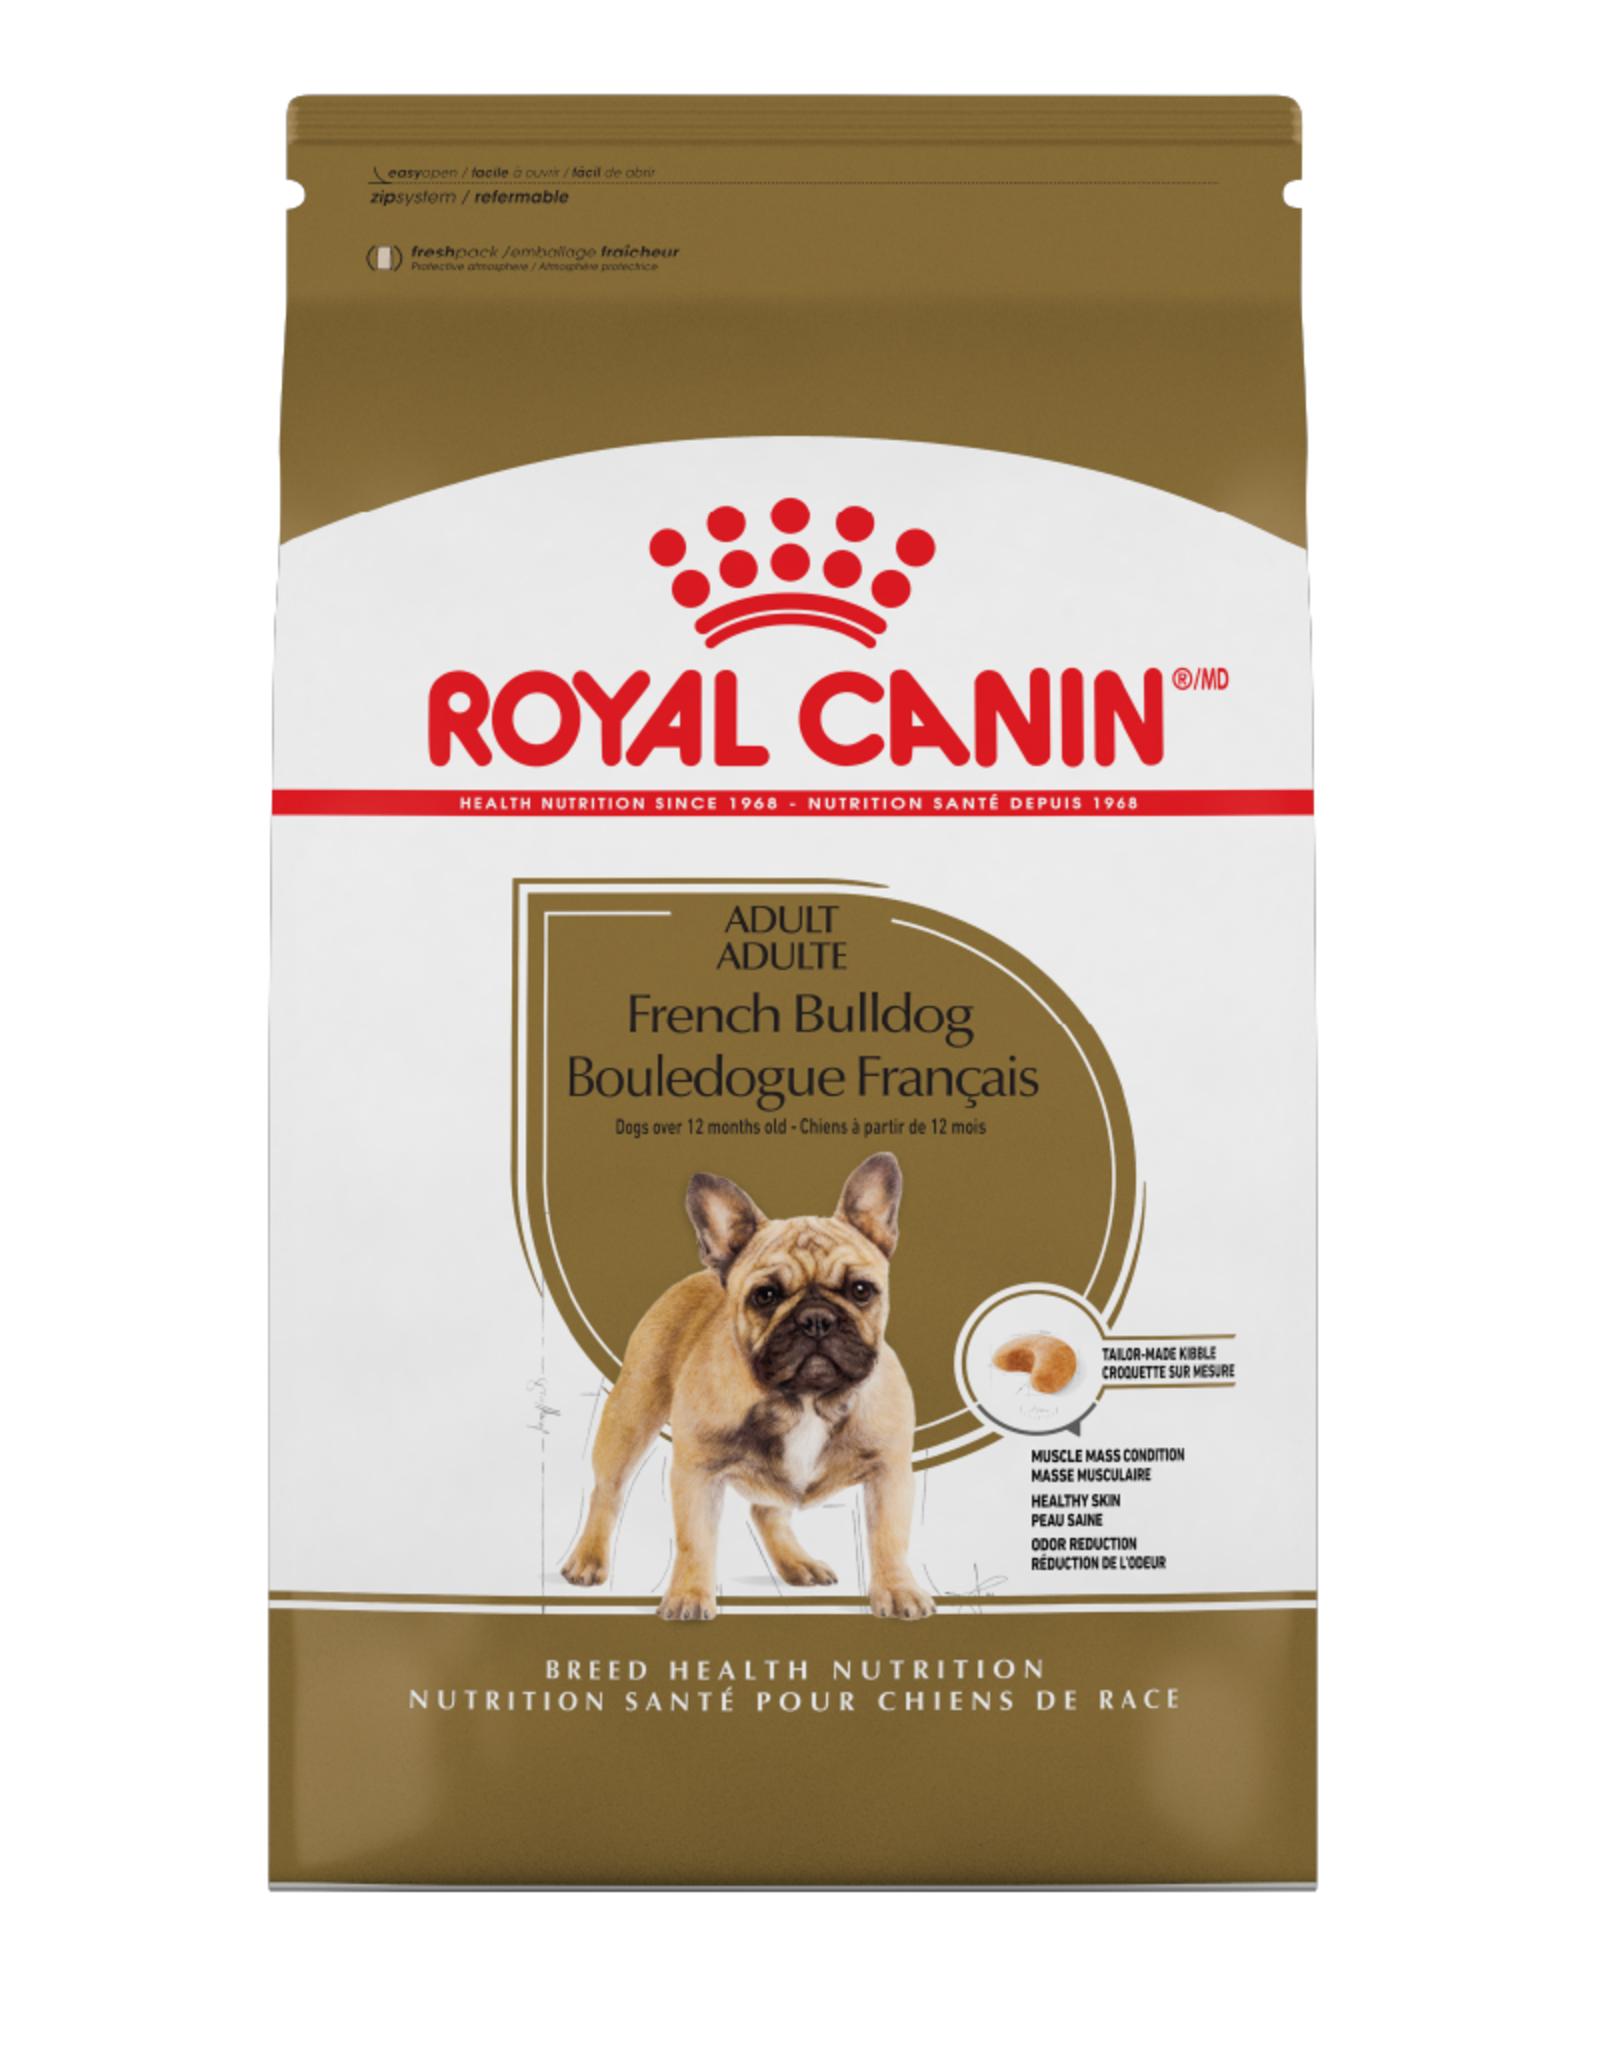 ROYAL CANIN Royal Canin | French Bulldog 17 lb